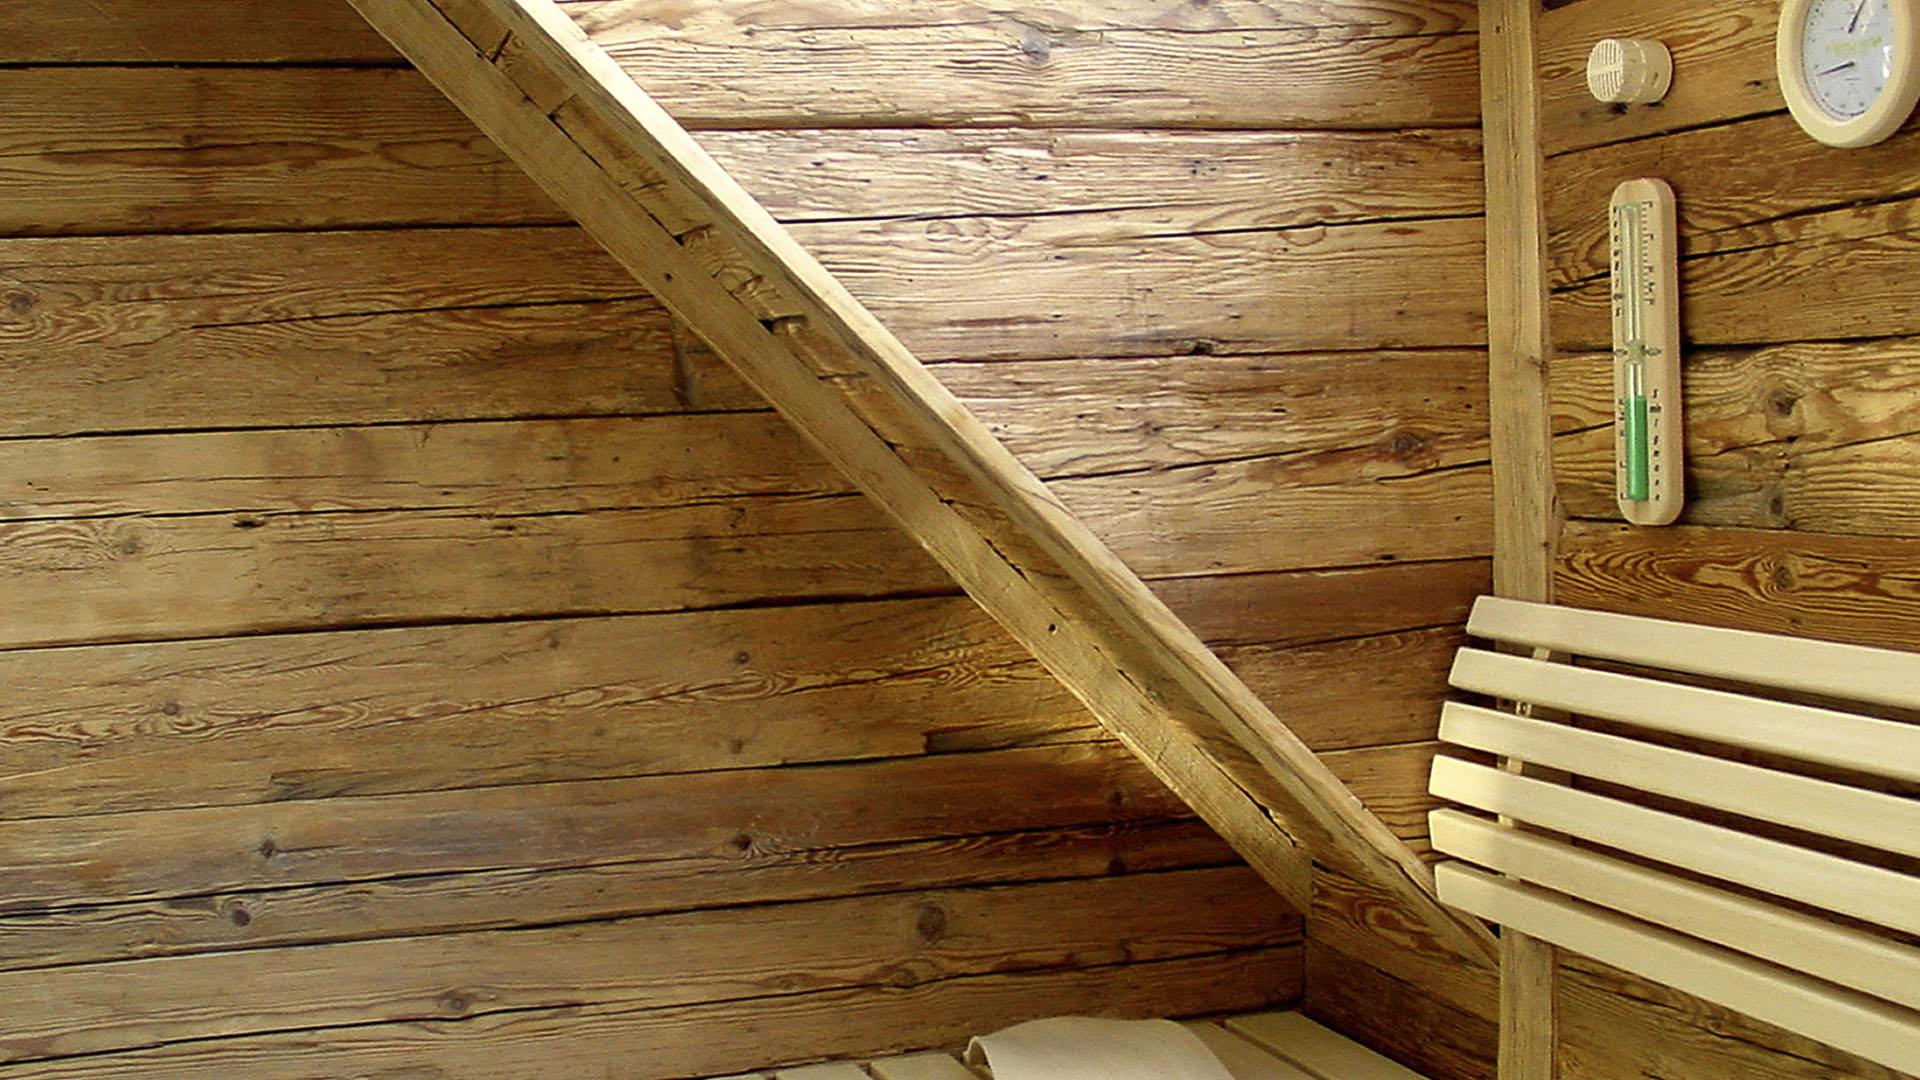 altholzverarbeitung altholzcenter buchegger in thalgau bei salzburg. Black Bedroom Furniture Sets. Home Design Ideas